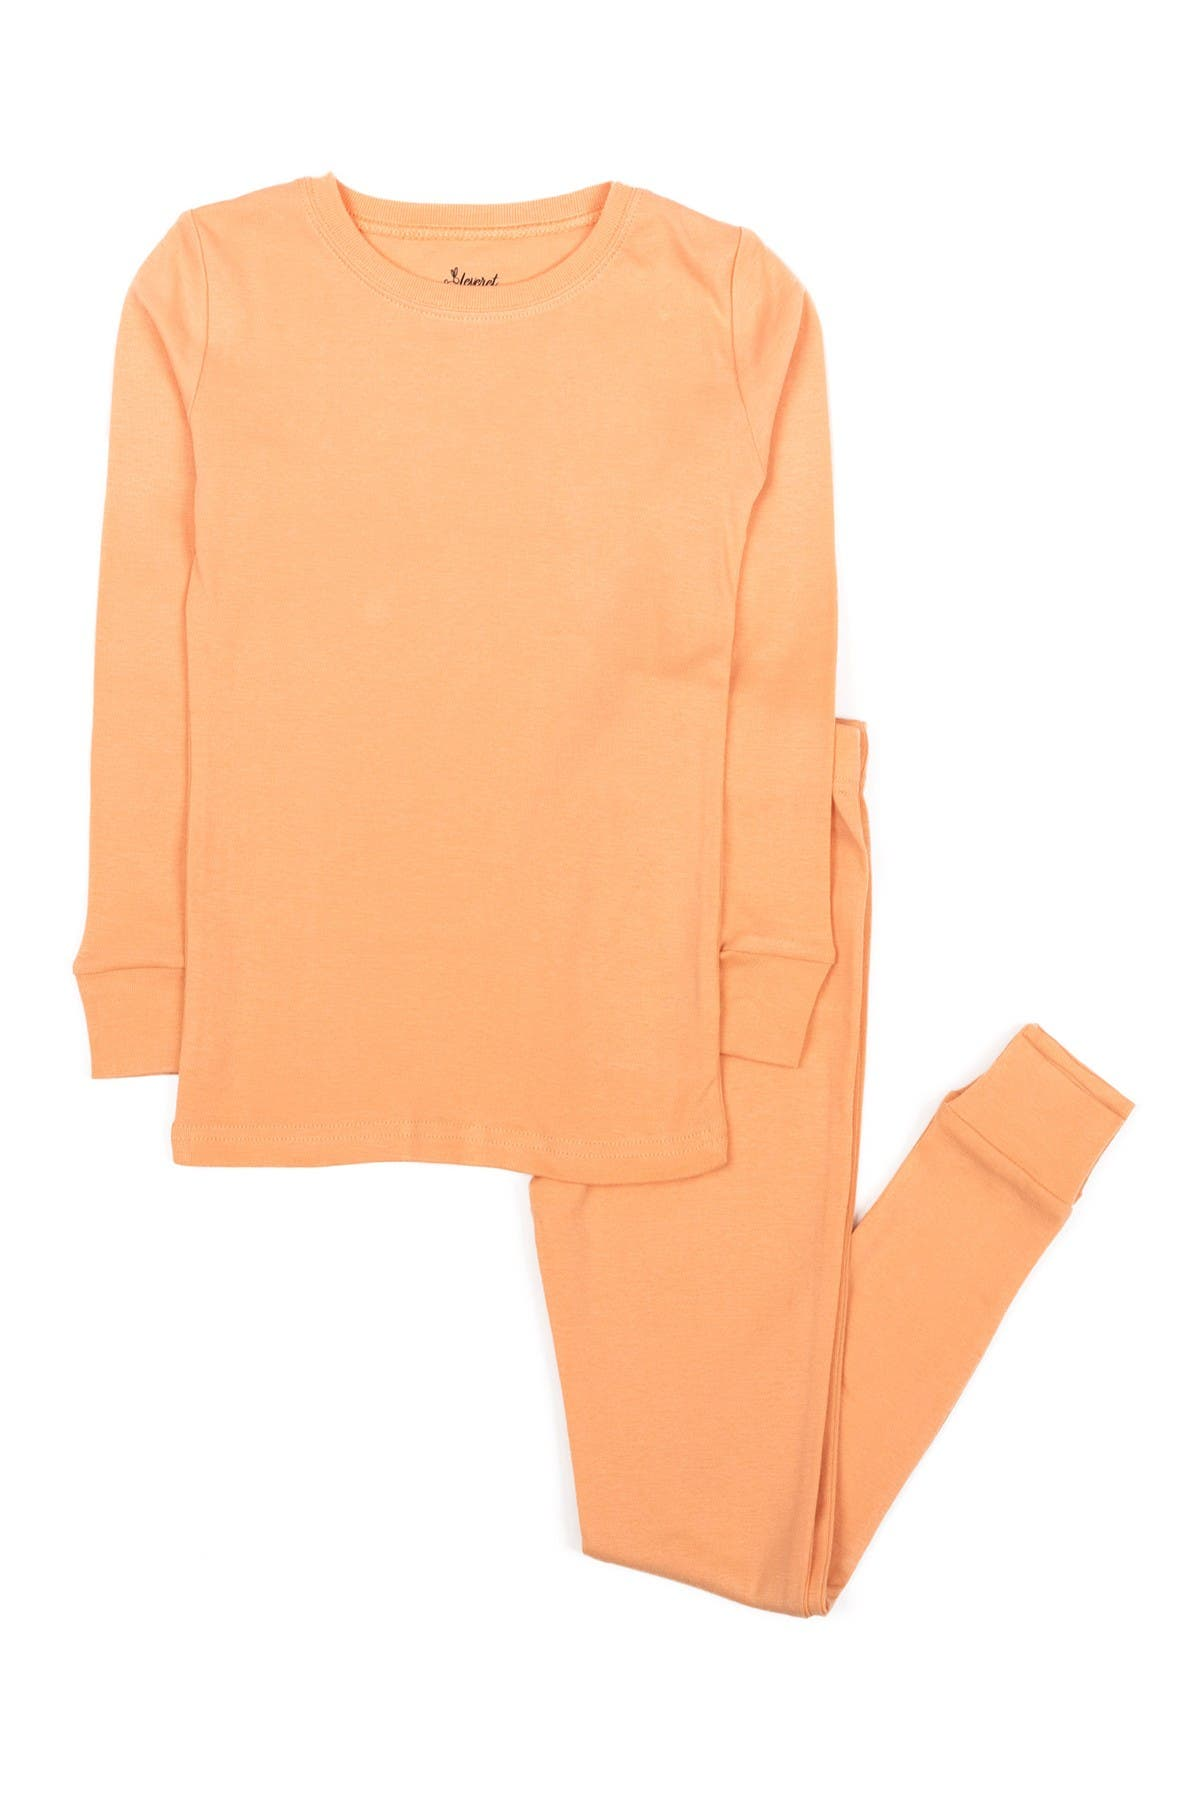 Image of Leveret Peach Two-Piece Cotton Pajamas